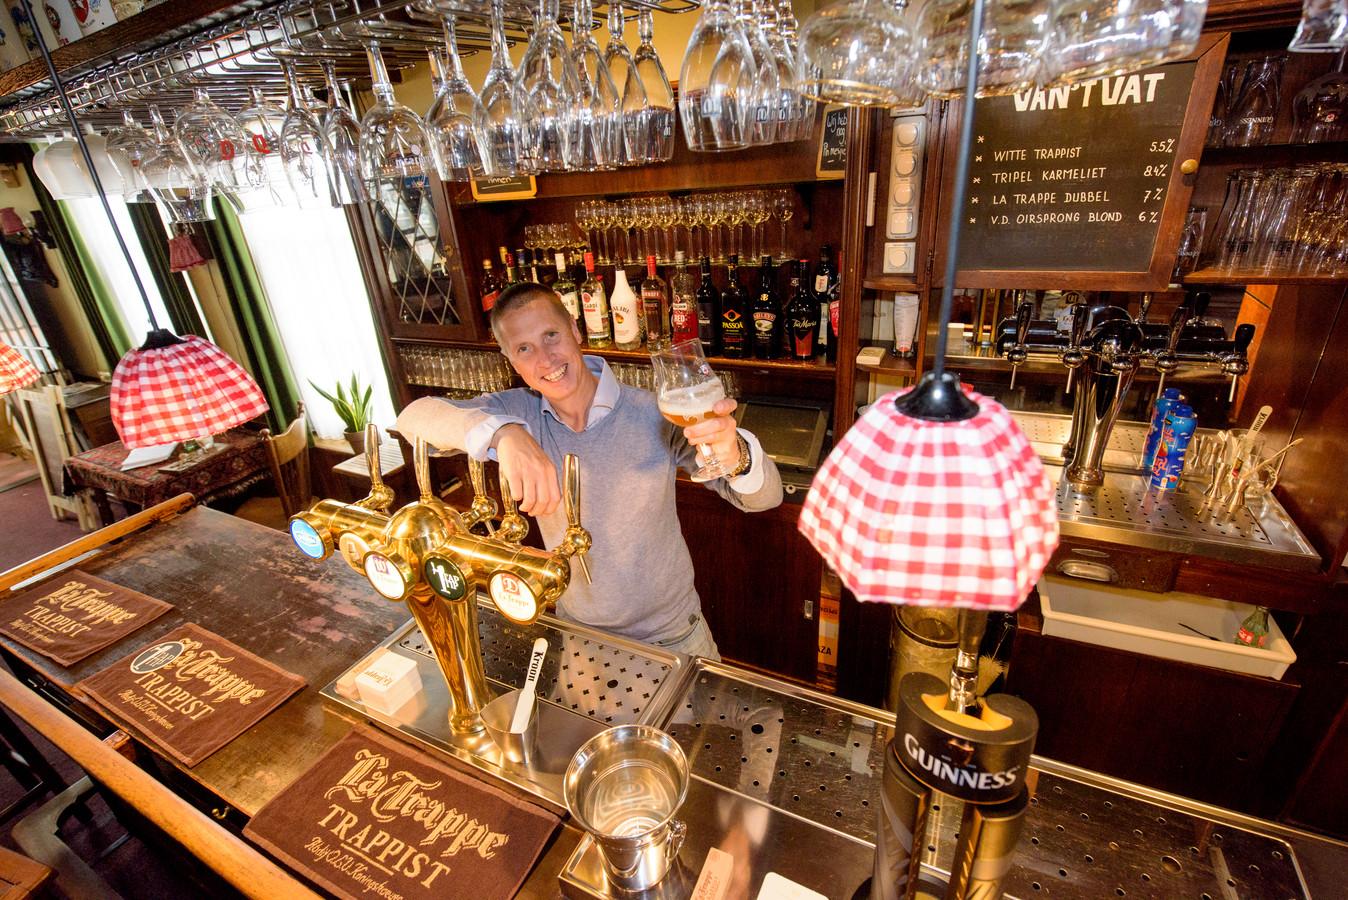 Rob Janssen achter de bar van café Oud Brabant in Oirschot.